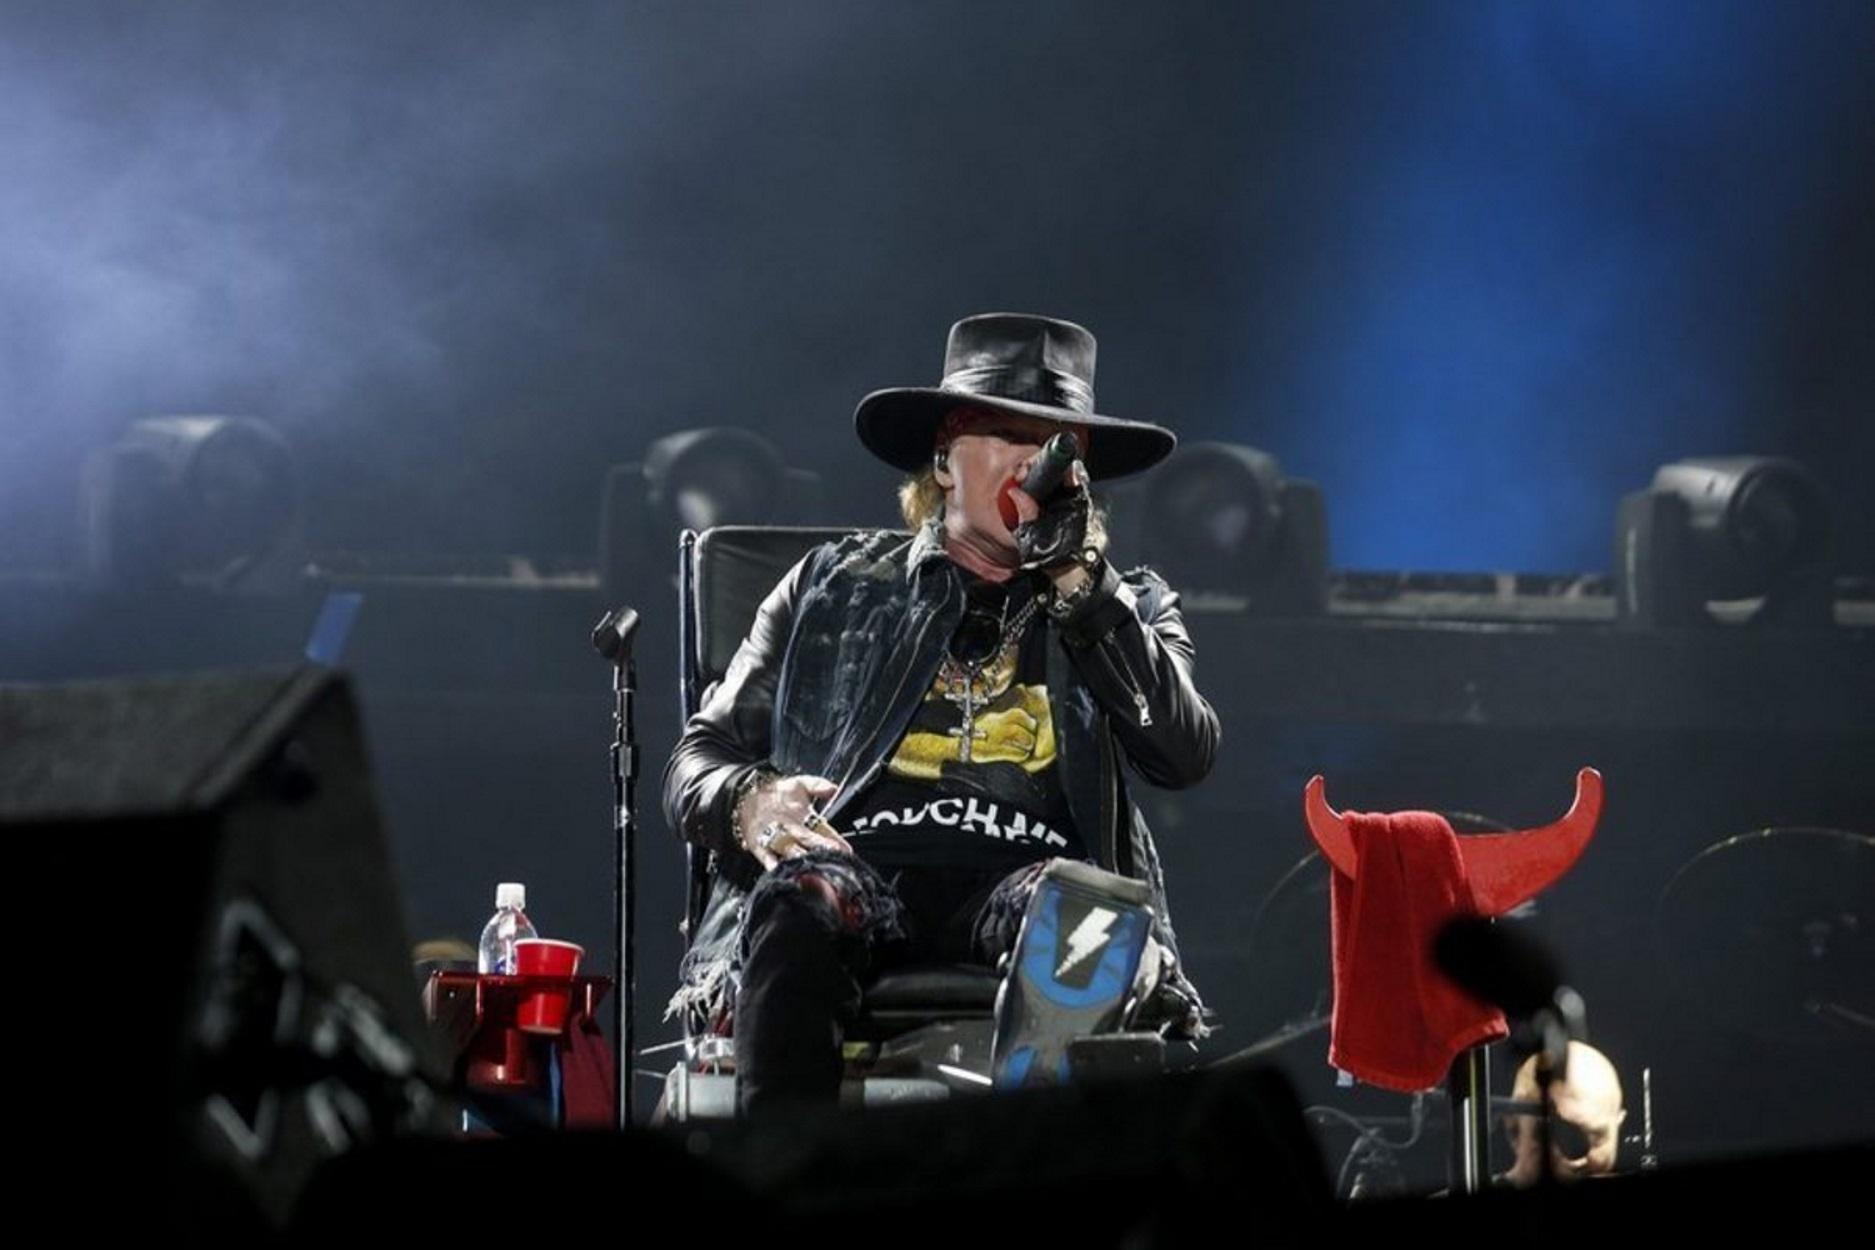 Guns N' Roses: Εμφανίστηκαν με προστατευτικές μάσκες για τον κορoνοϊό (pic)